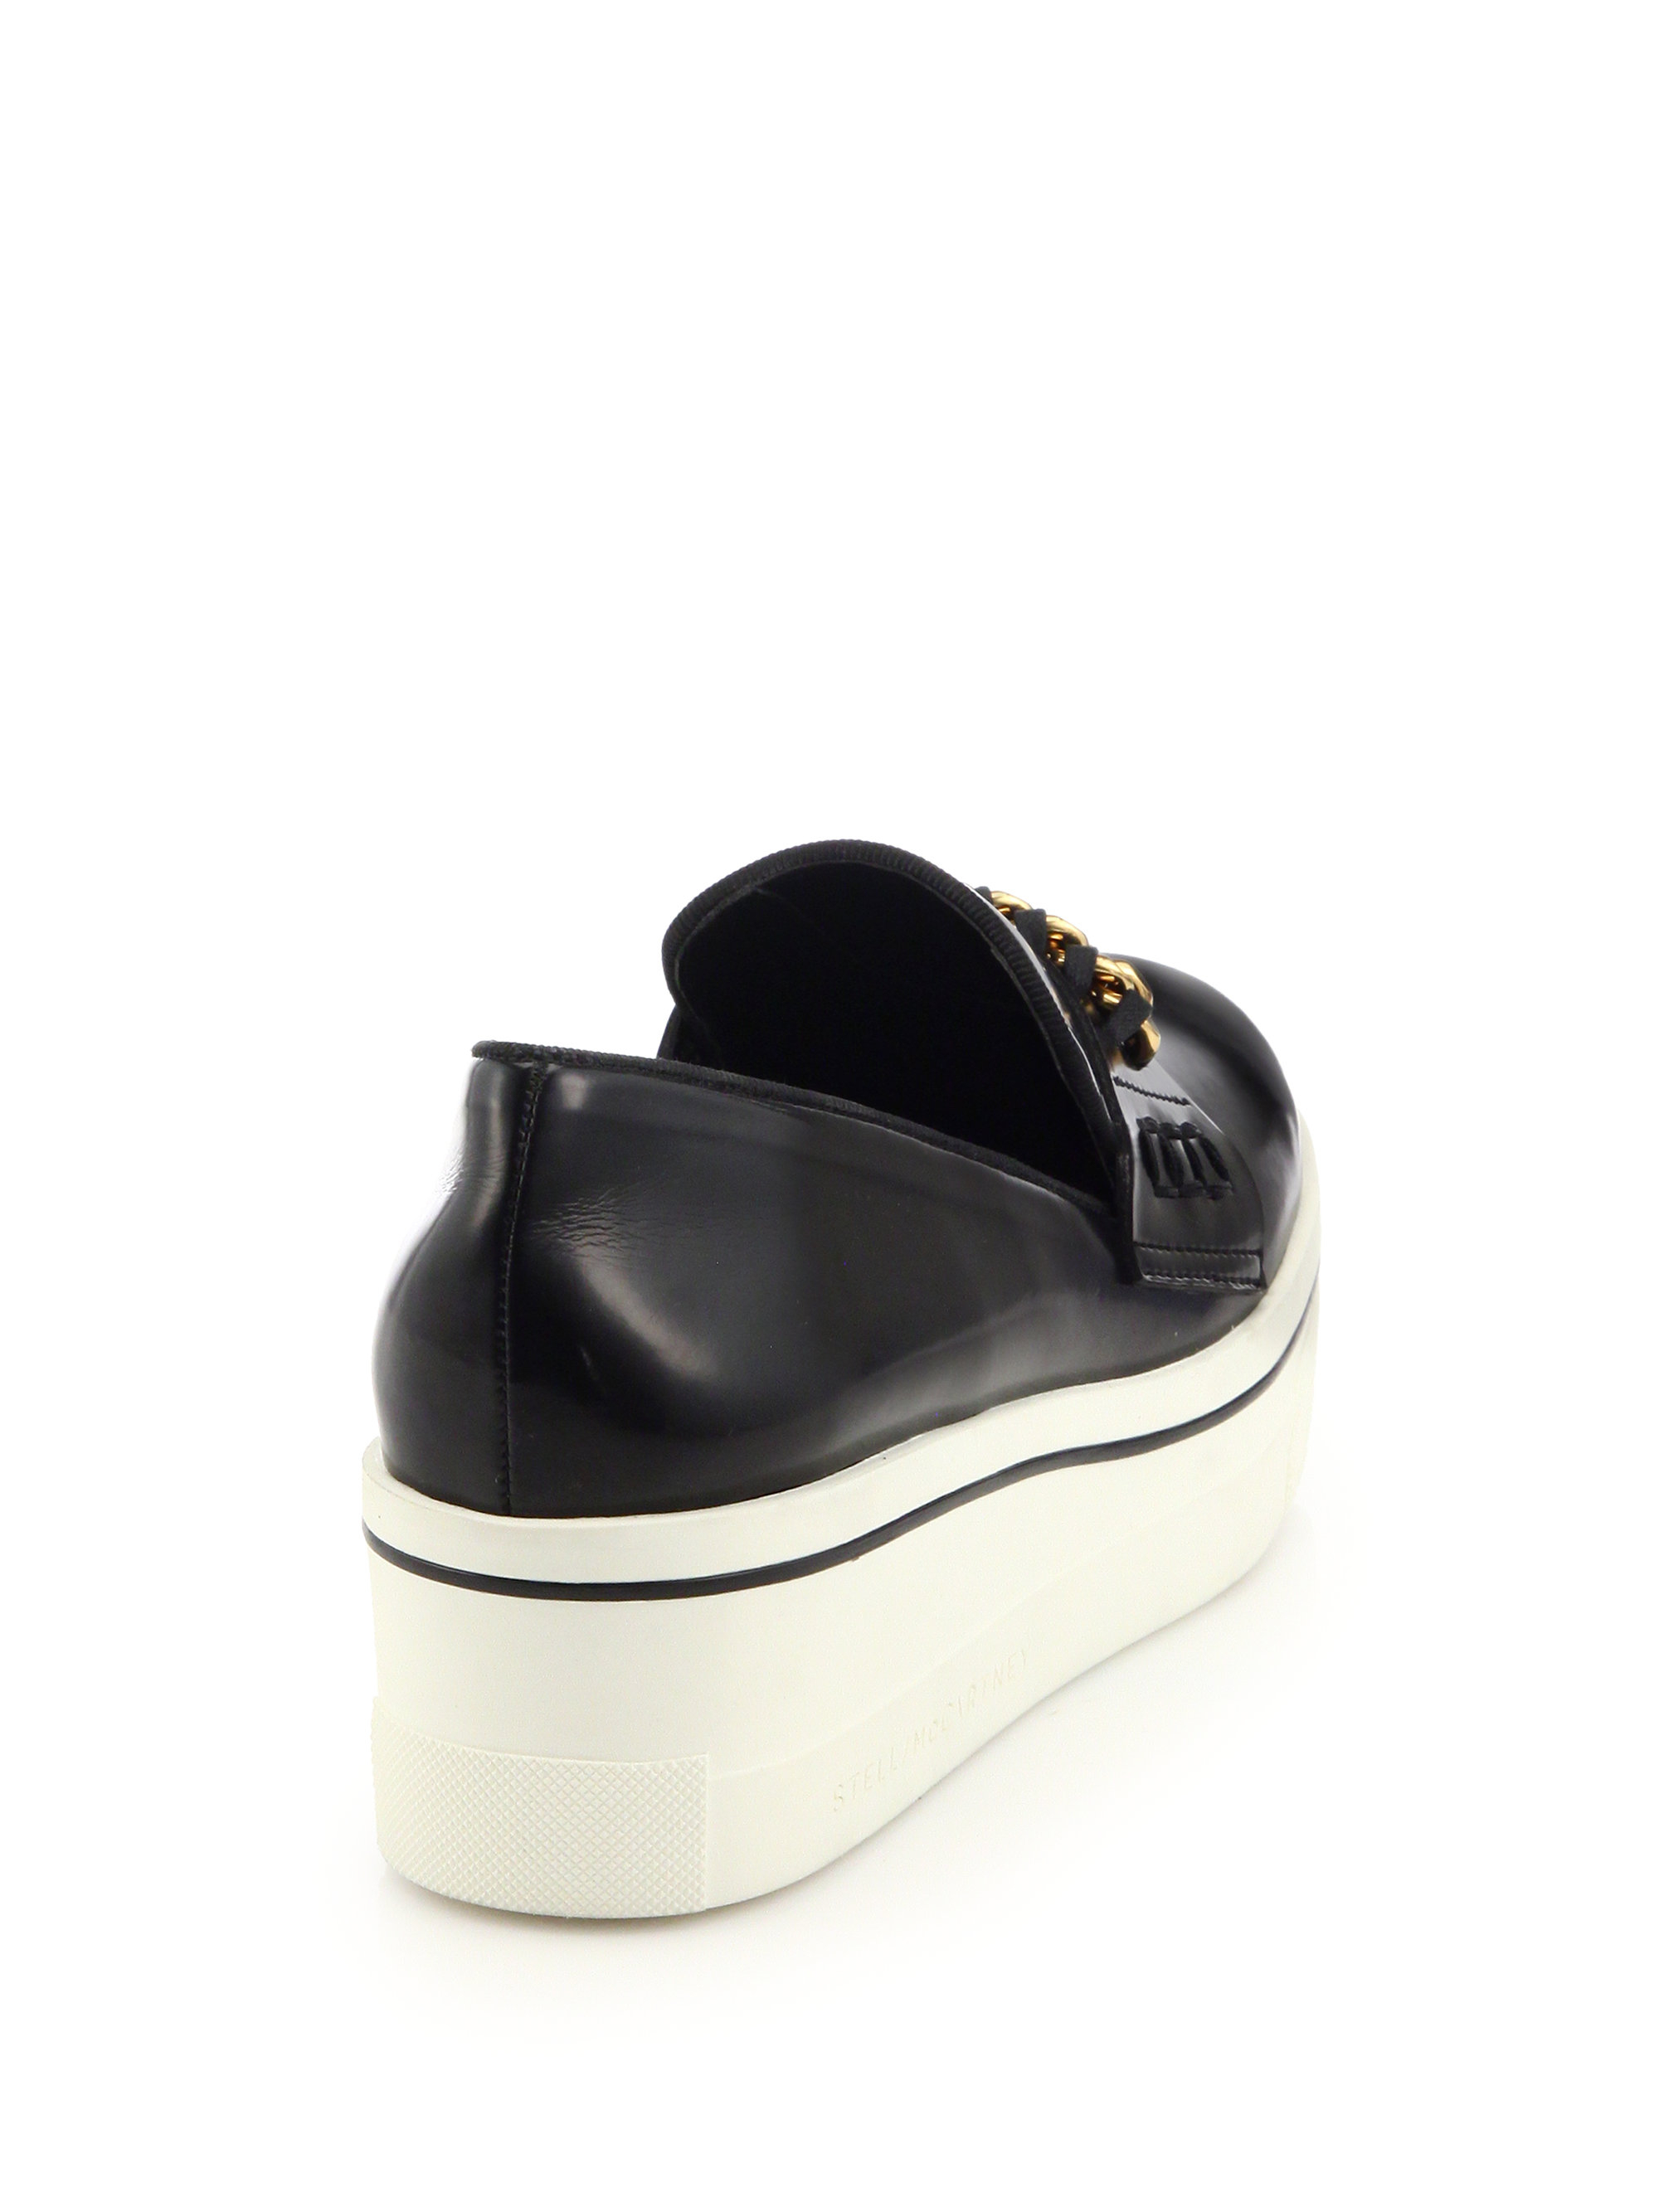 Stella Mccartney Shoes Heels